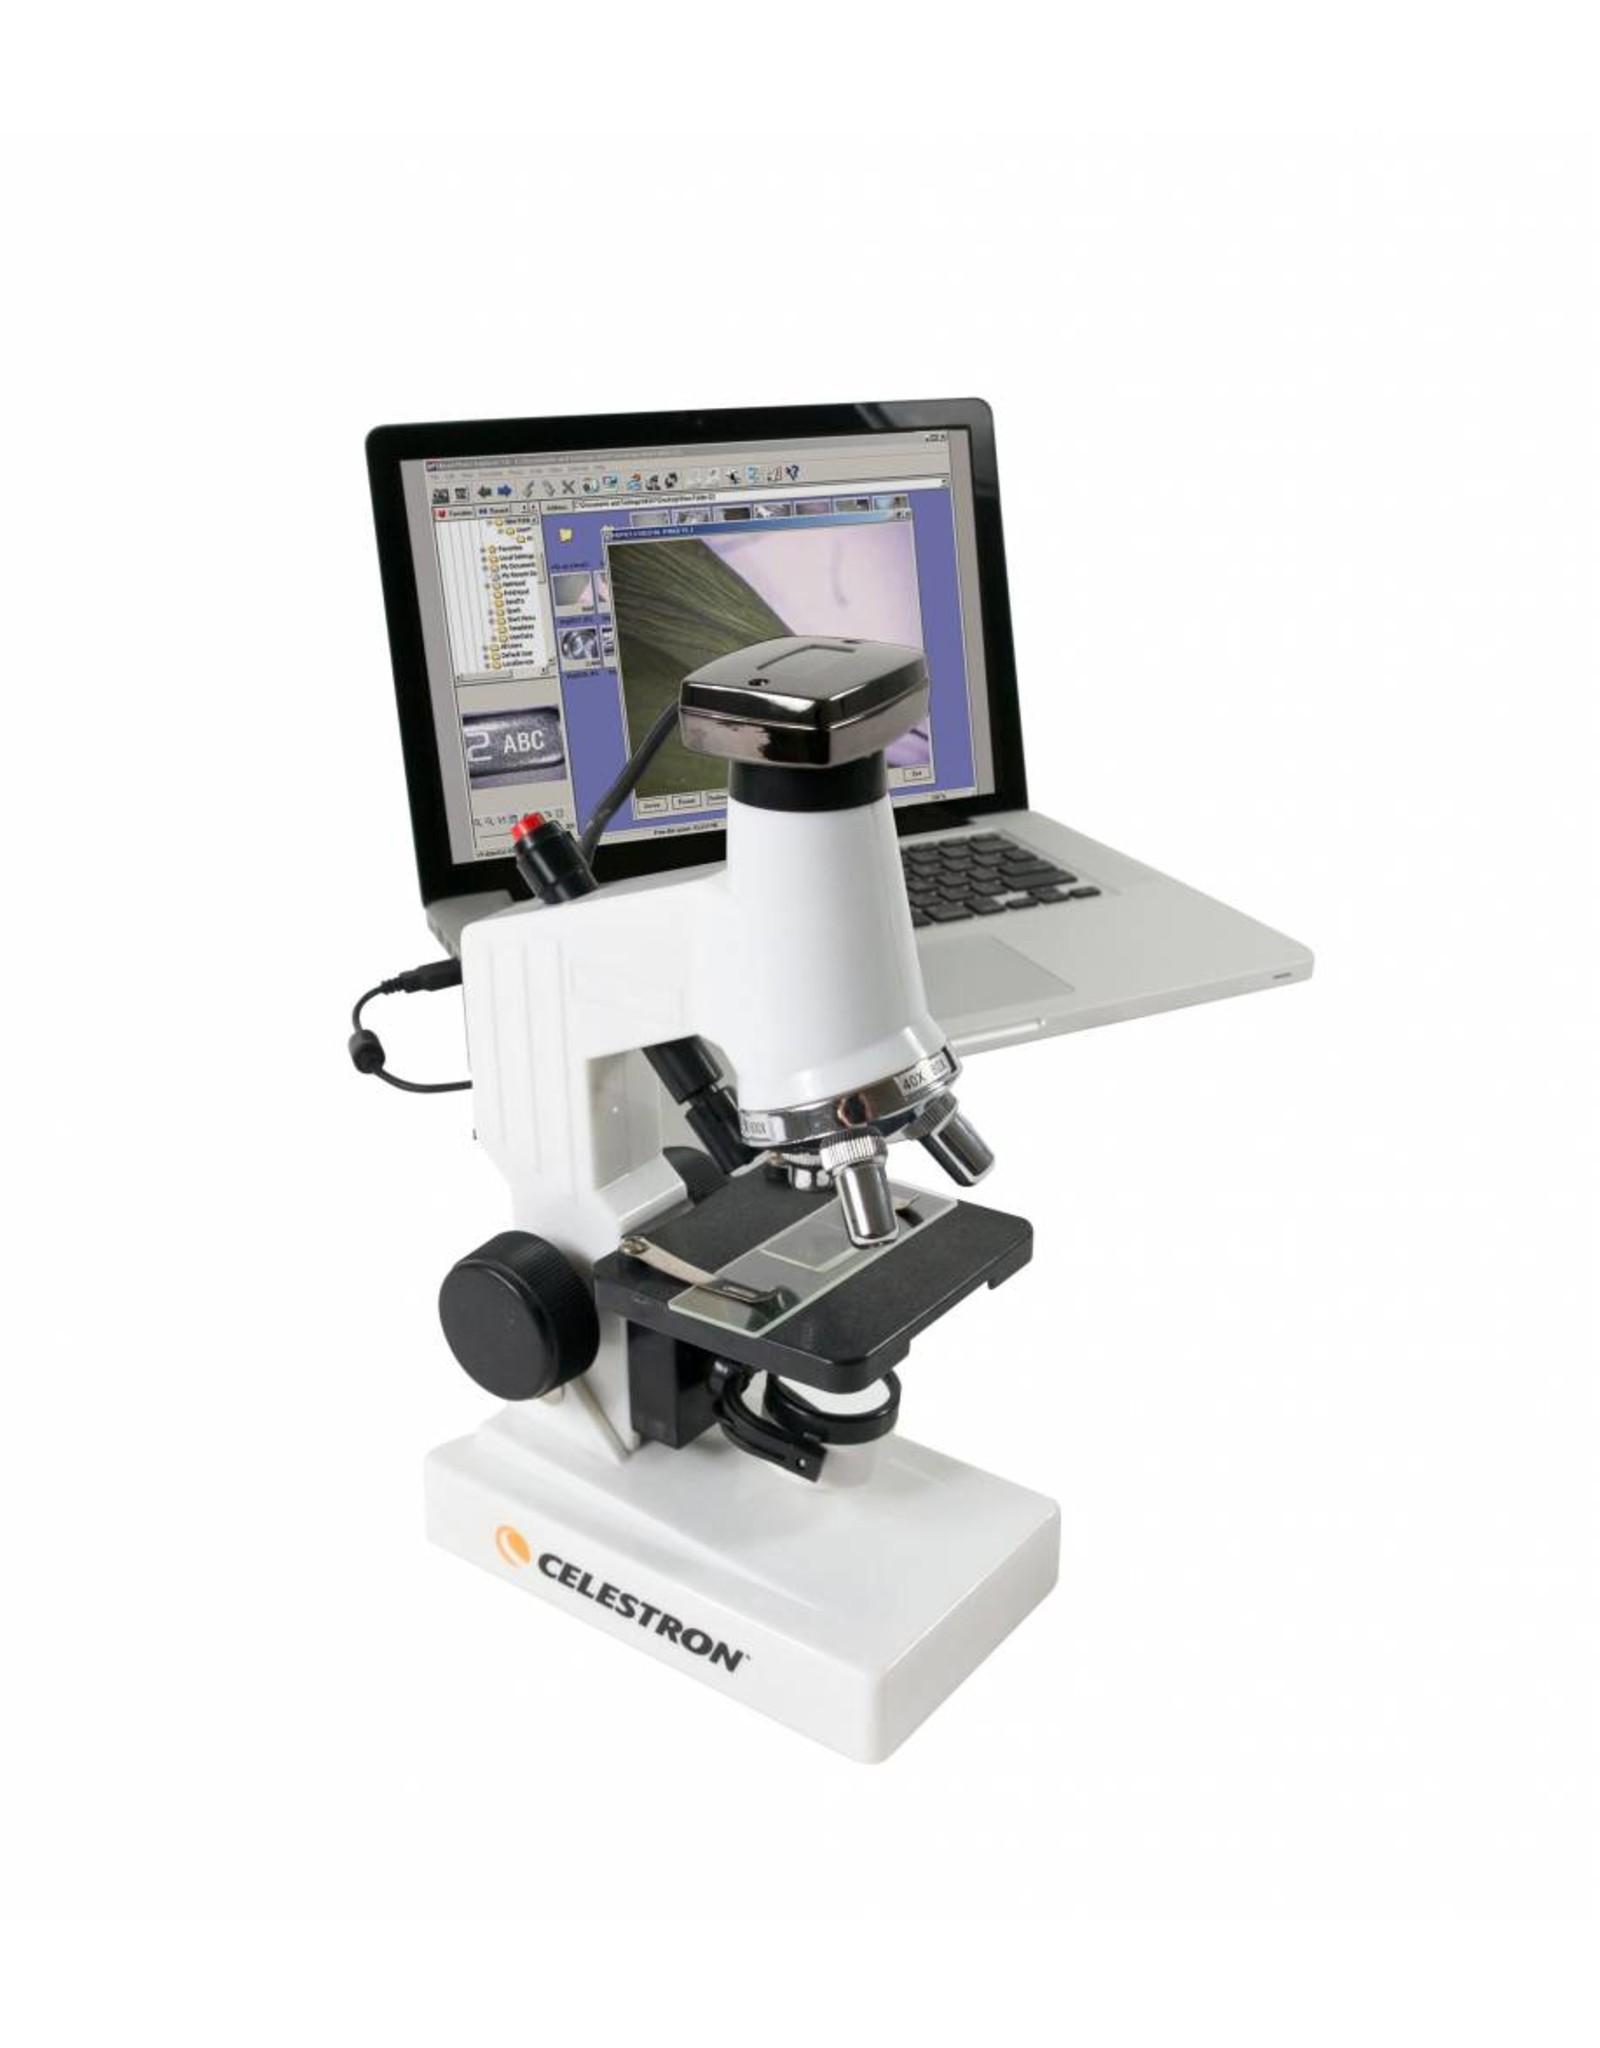 Celestron Celestron Digital Microscope Kit